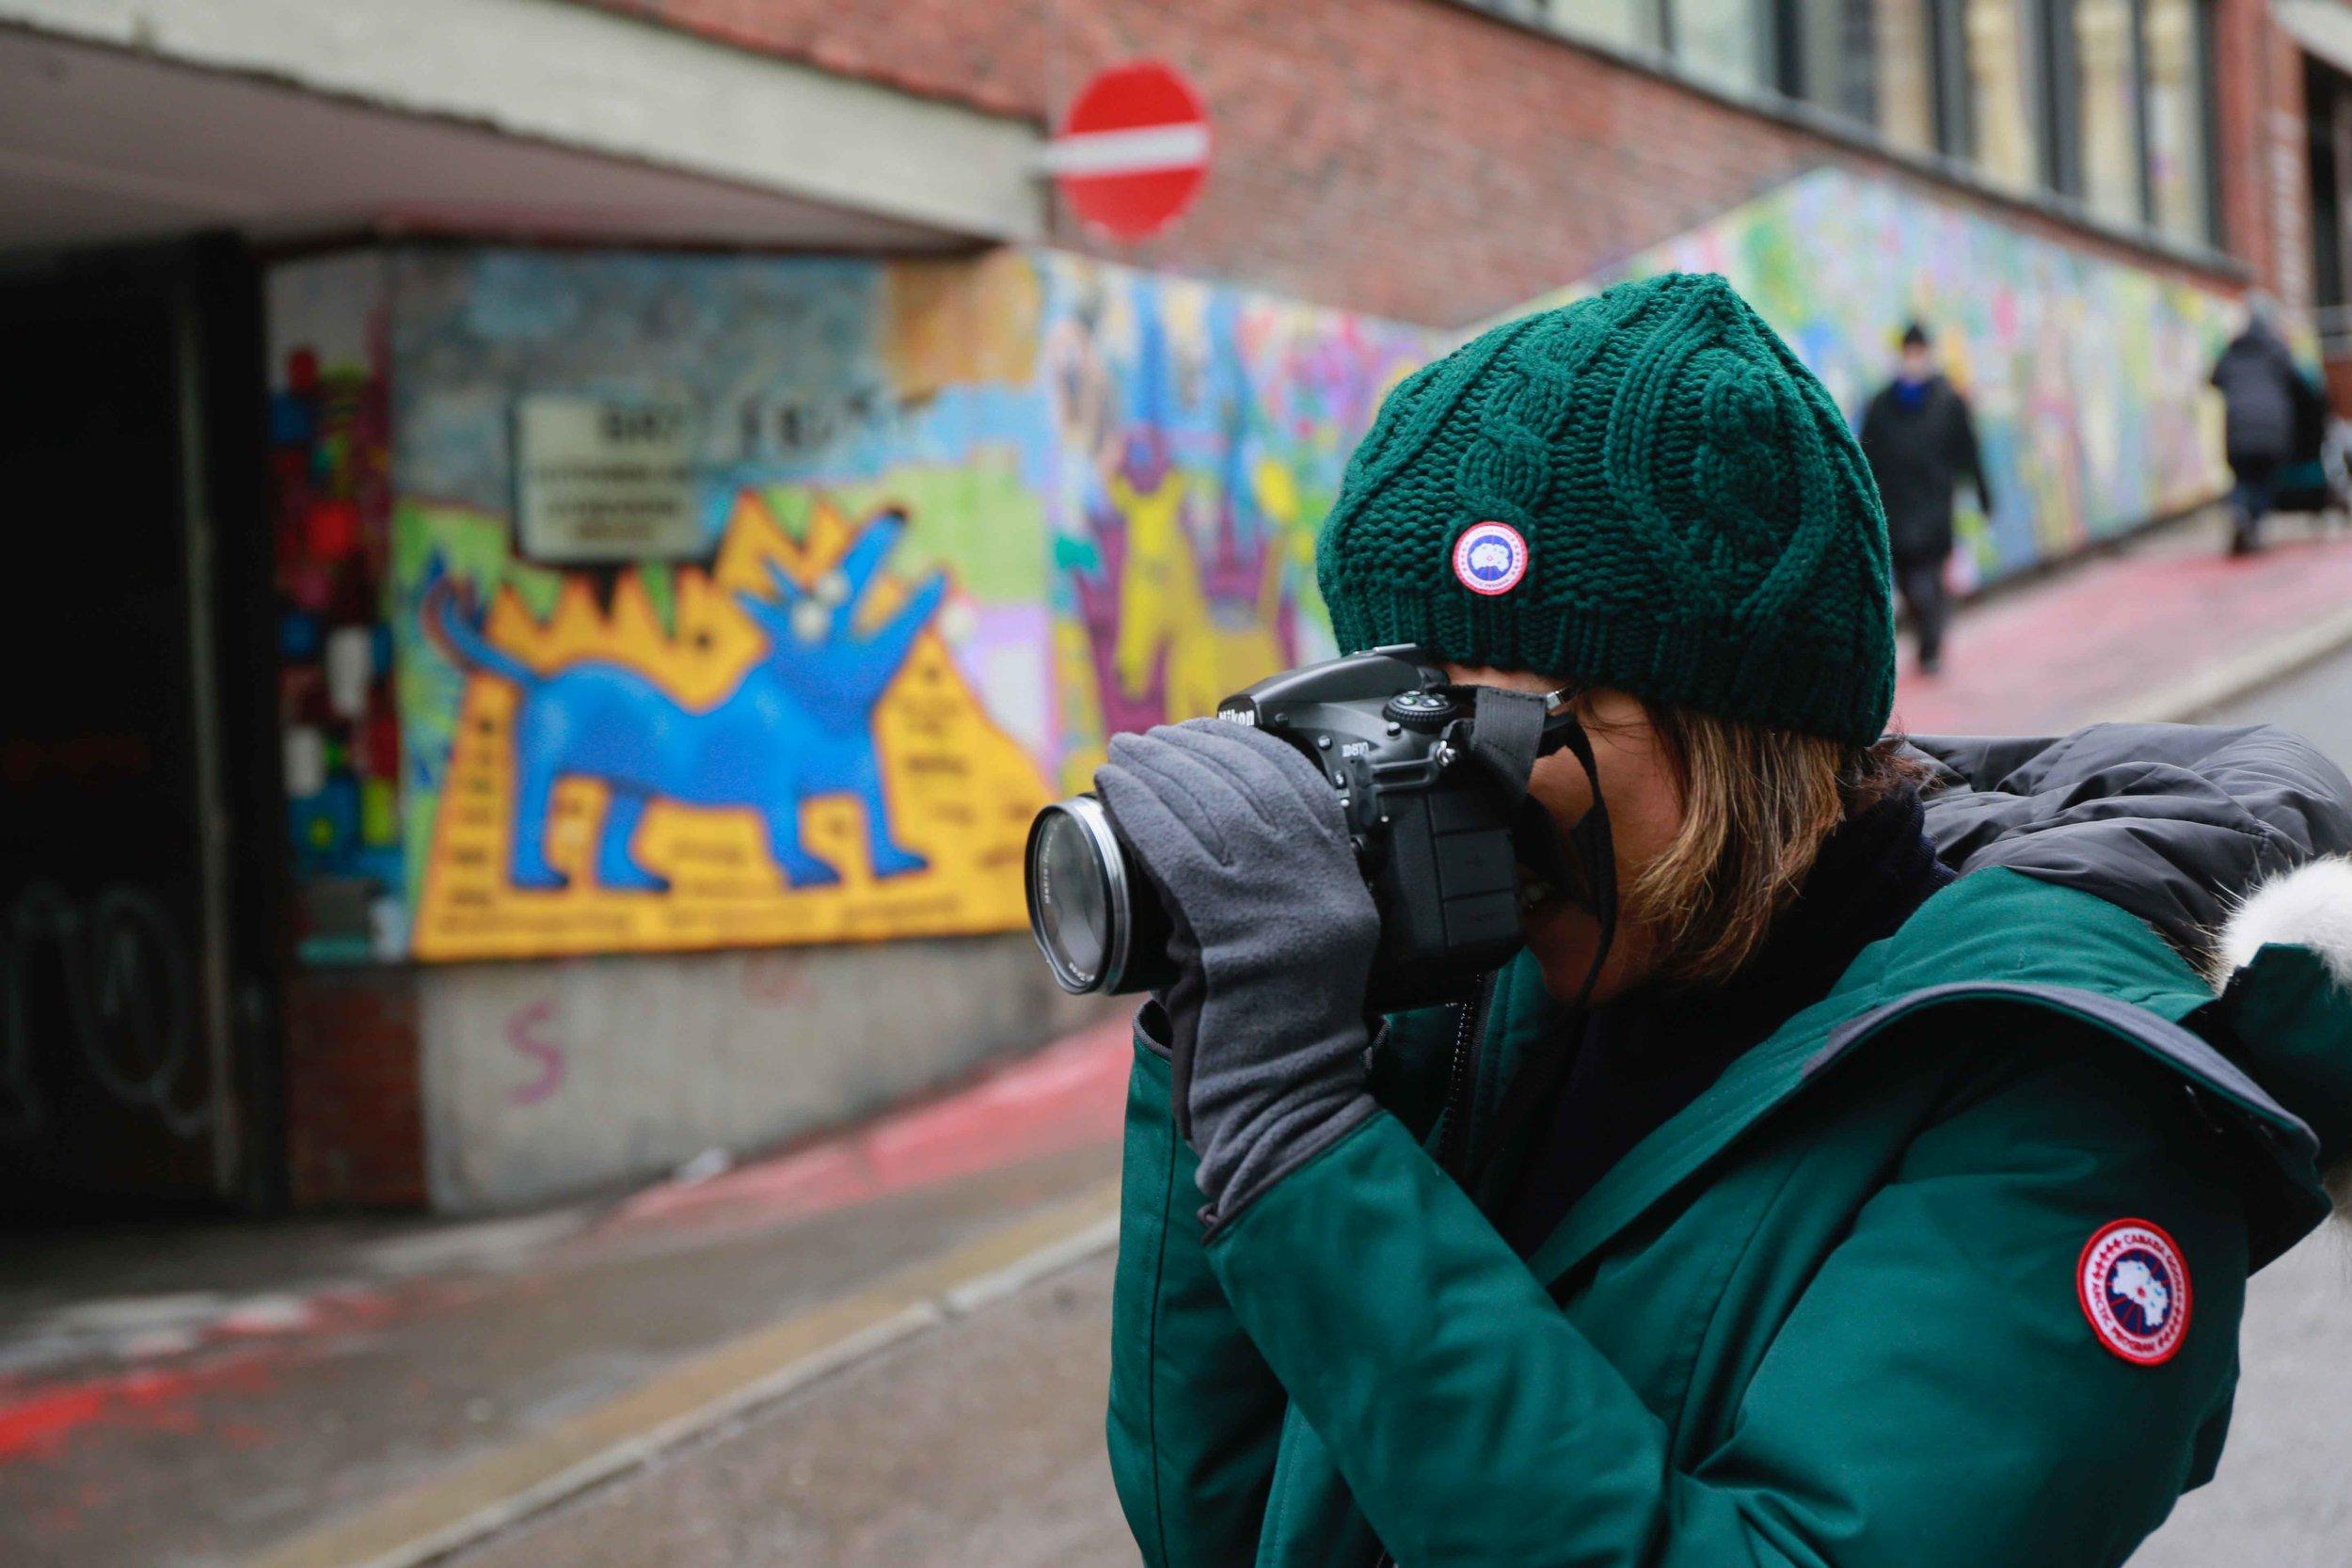 Canada goose Rossclair parka, beanie,Street Art, Brenneriveien & Vulkan,Oslo. Photo: Oslo Photo Tour. Image©thingstodot.com